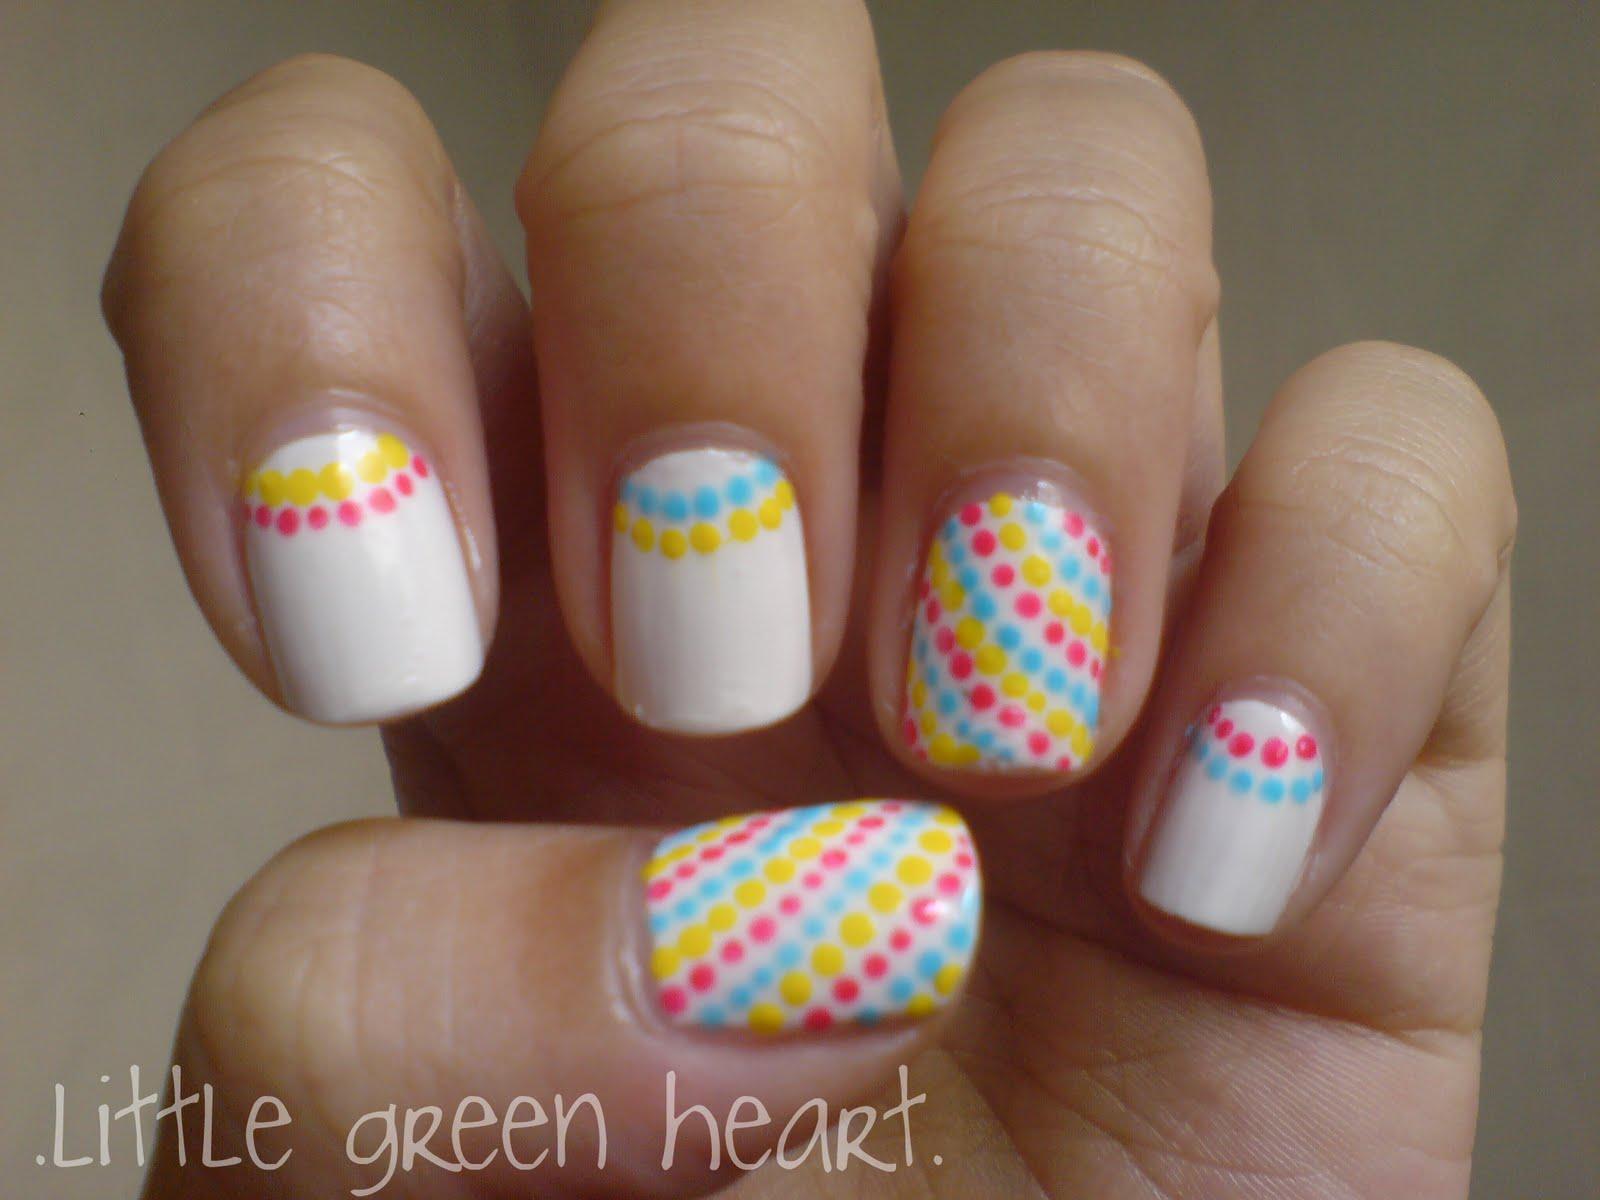 Cute Nail Art Designs for Short Nails